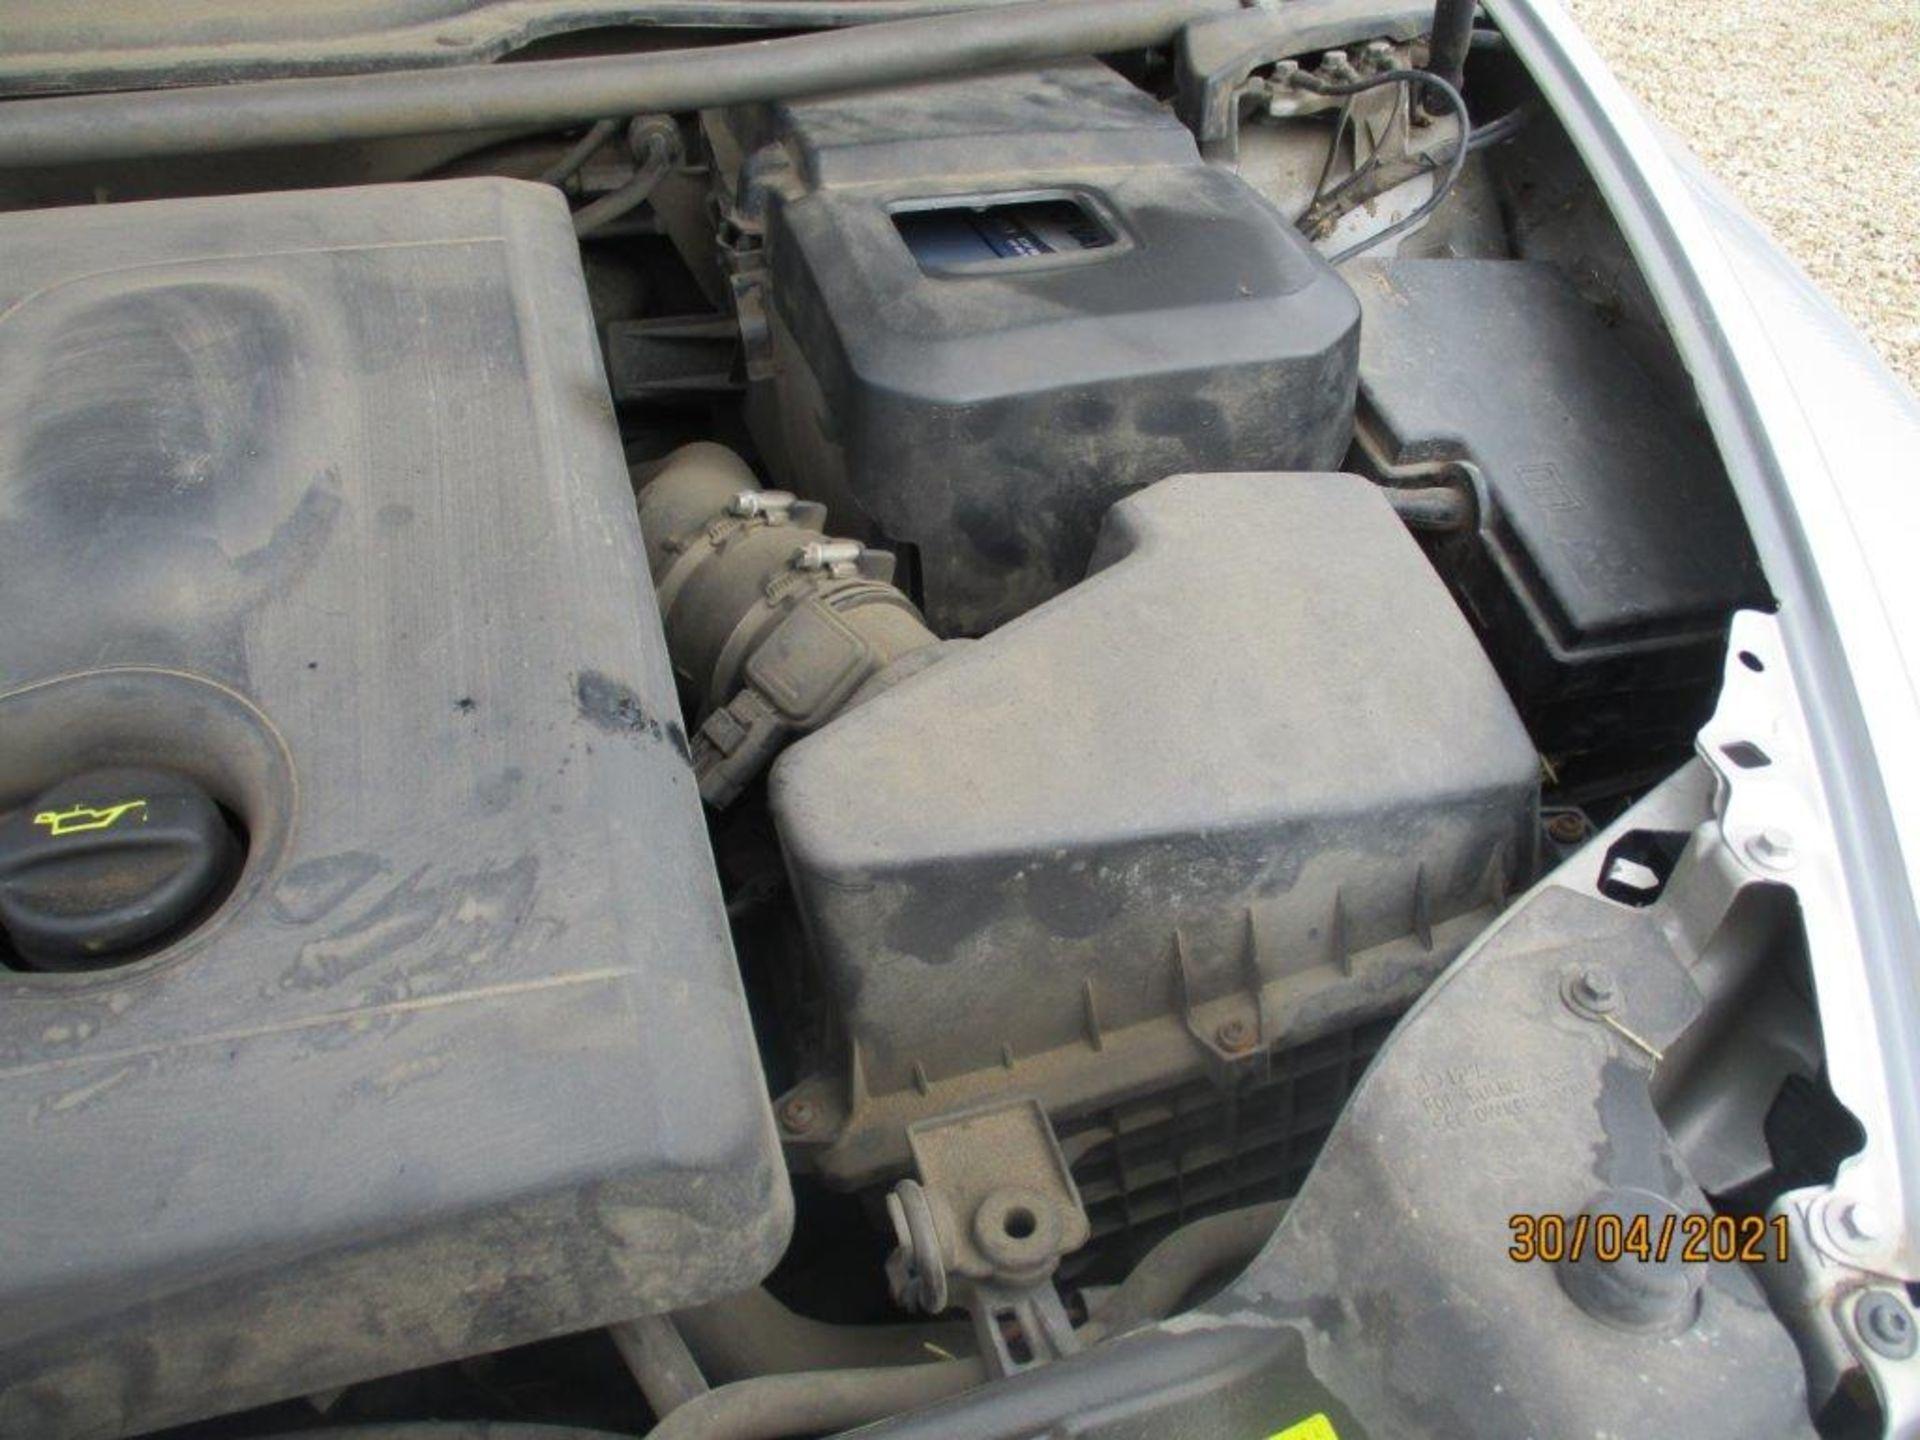 06 06 Volvo V50 SE D (E4) Est - Image 25 of 26